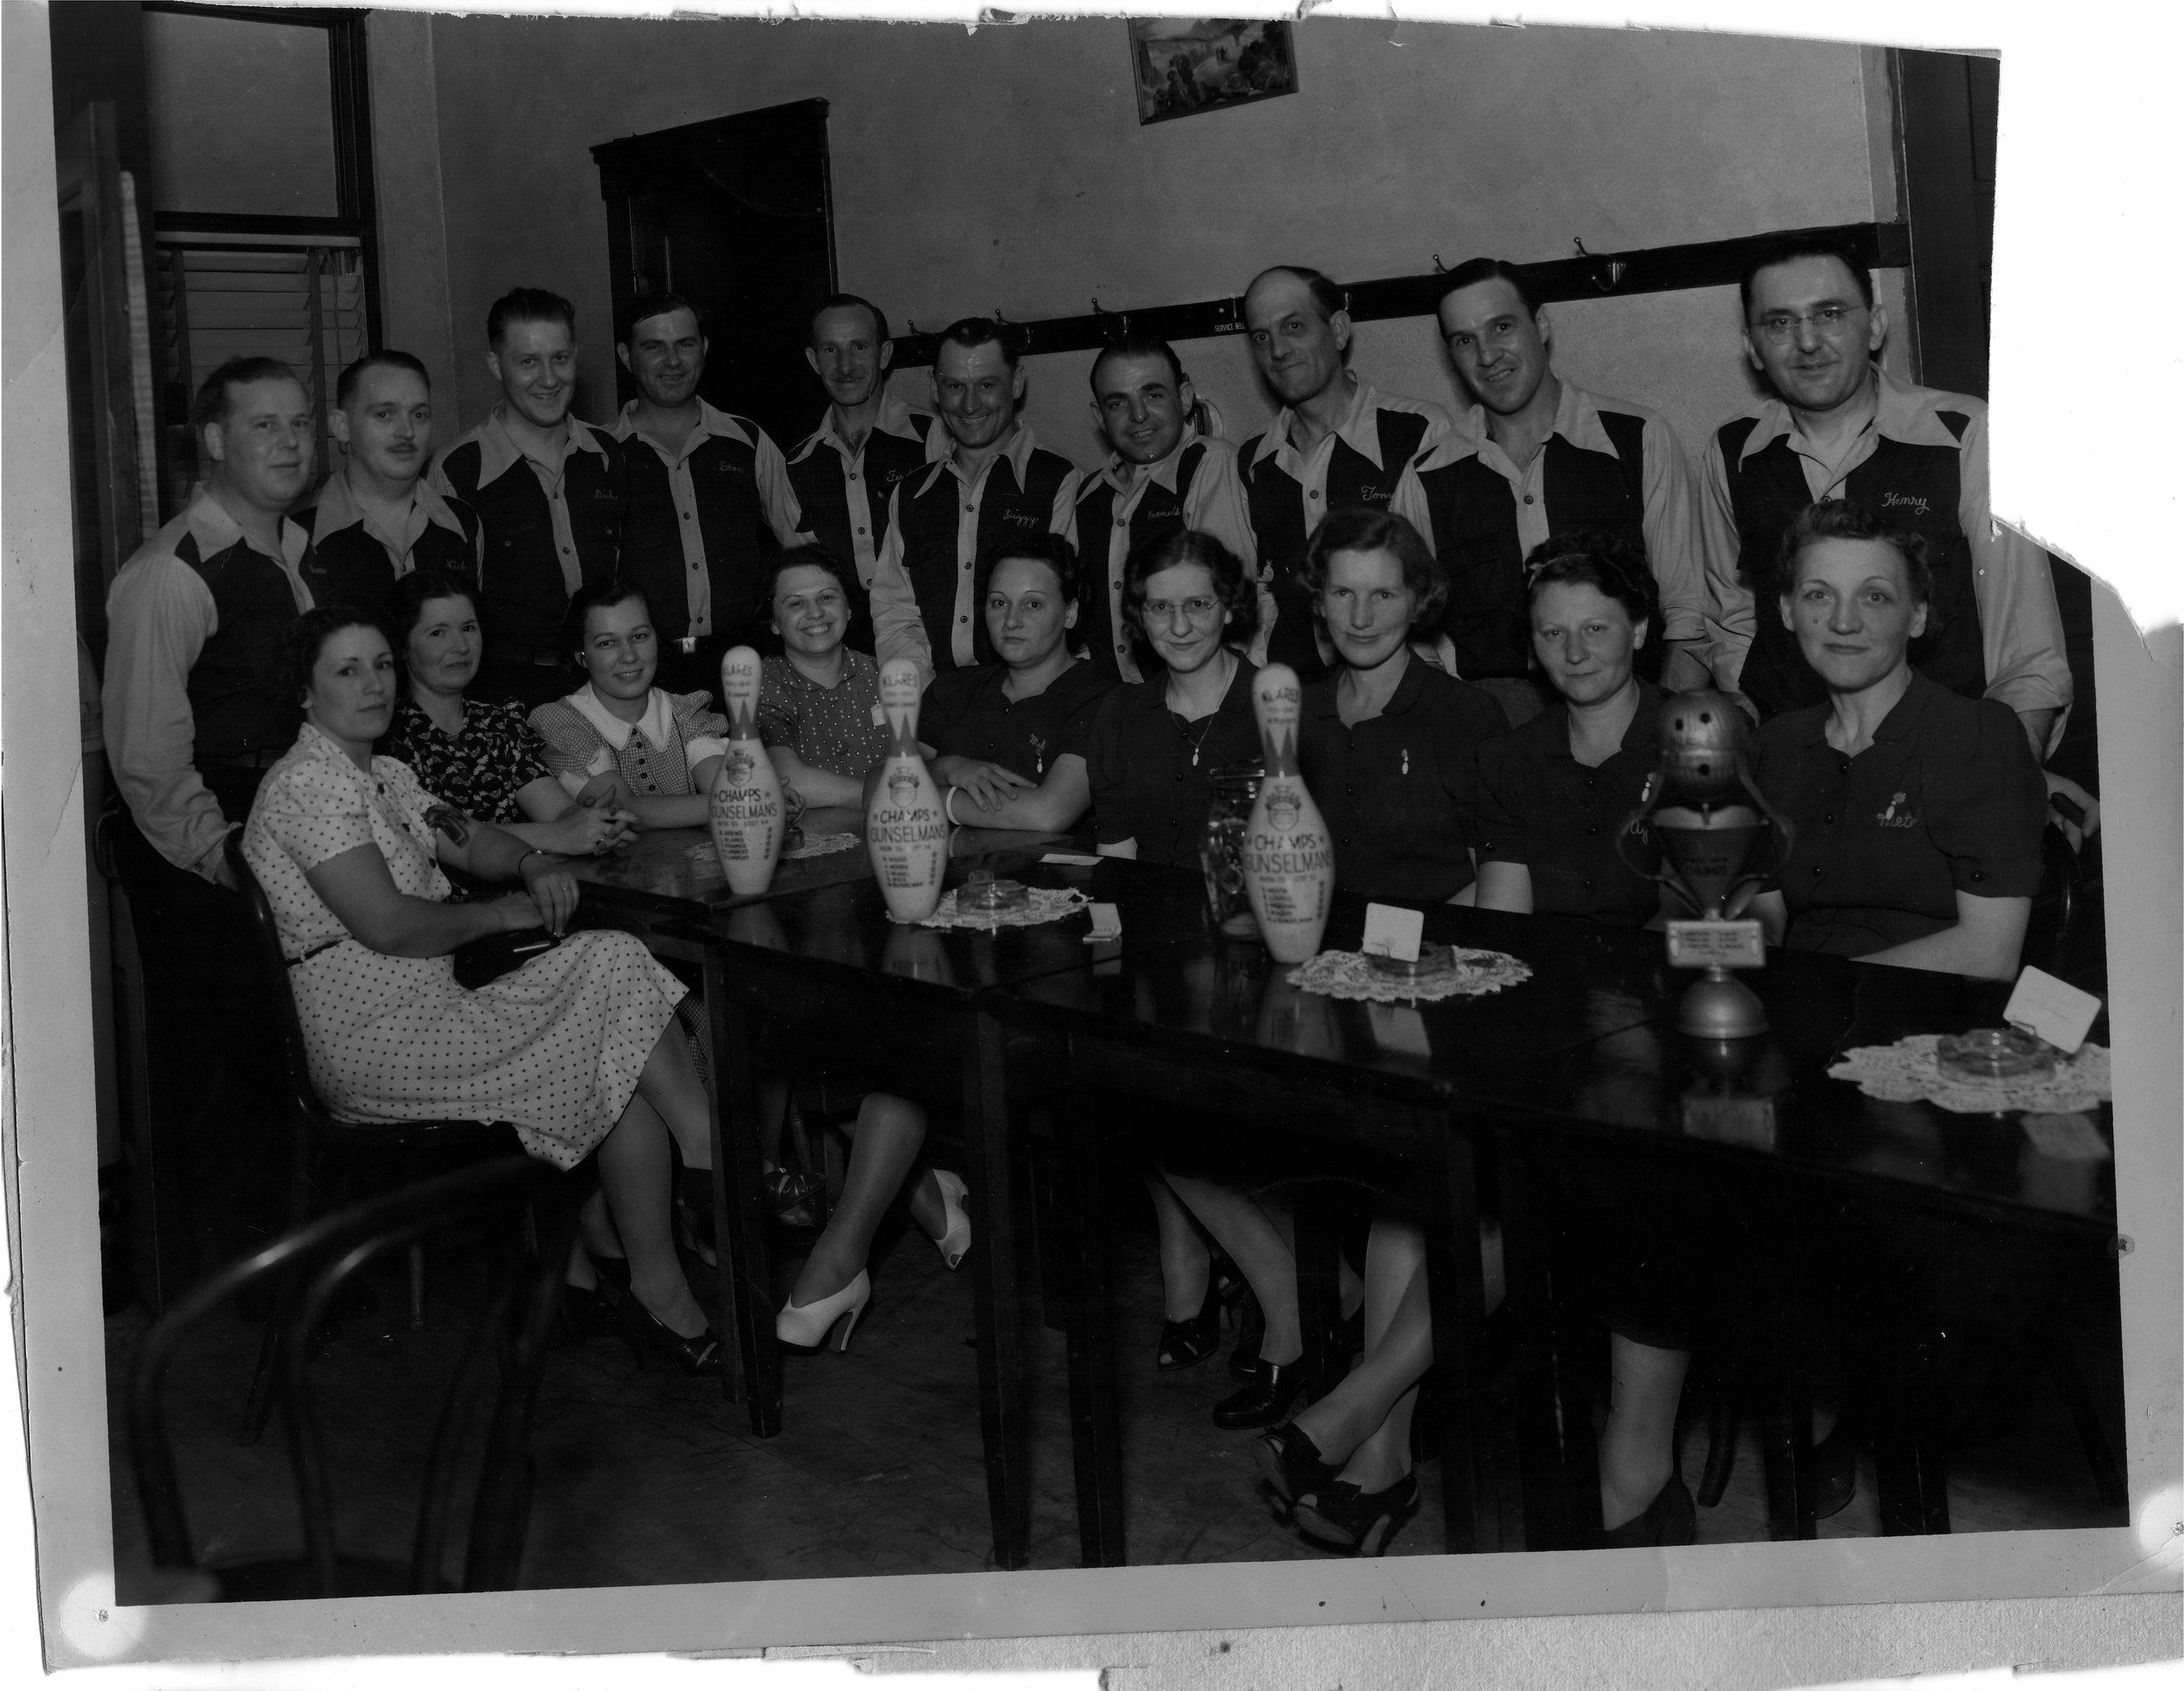 Gunselman's-dining-room---bowling-awards.jpg